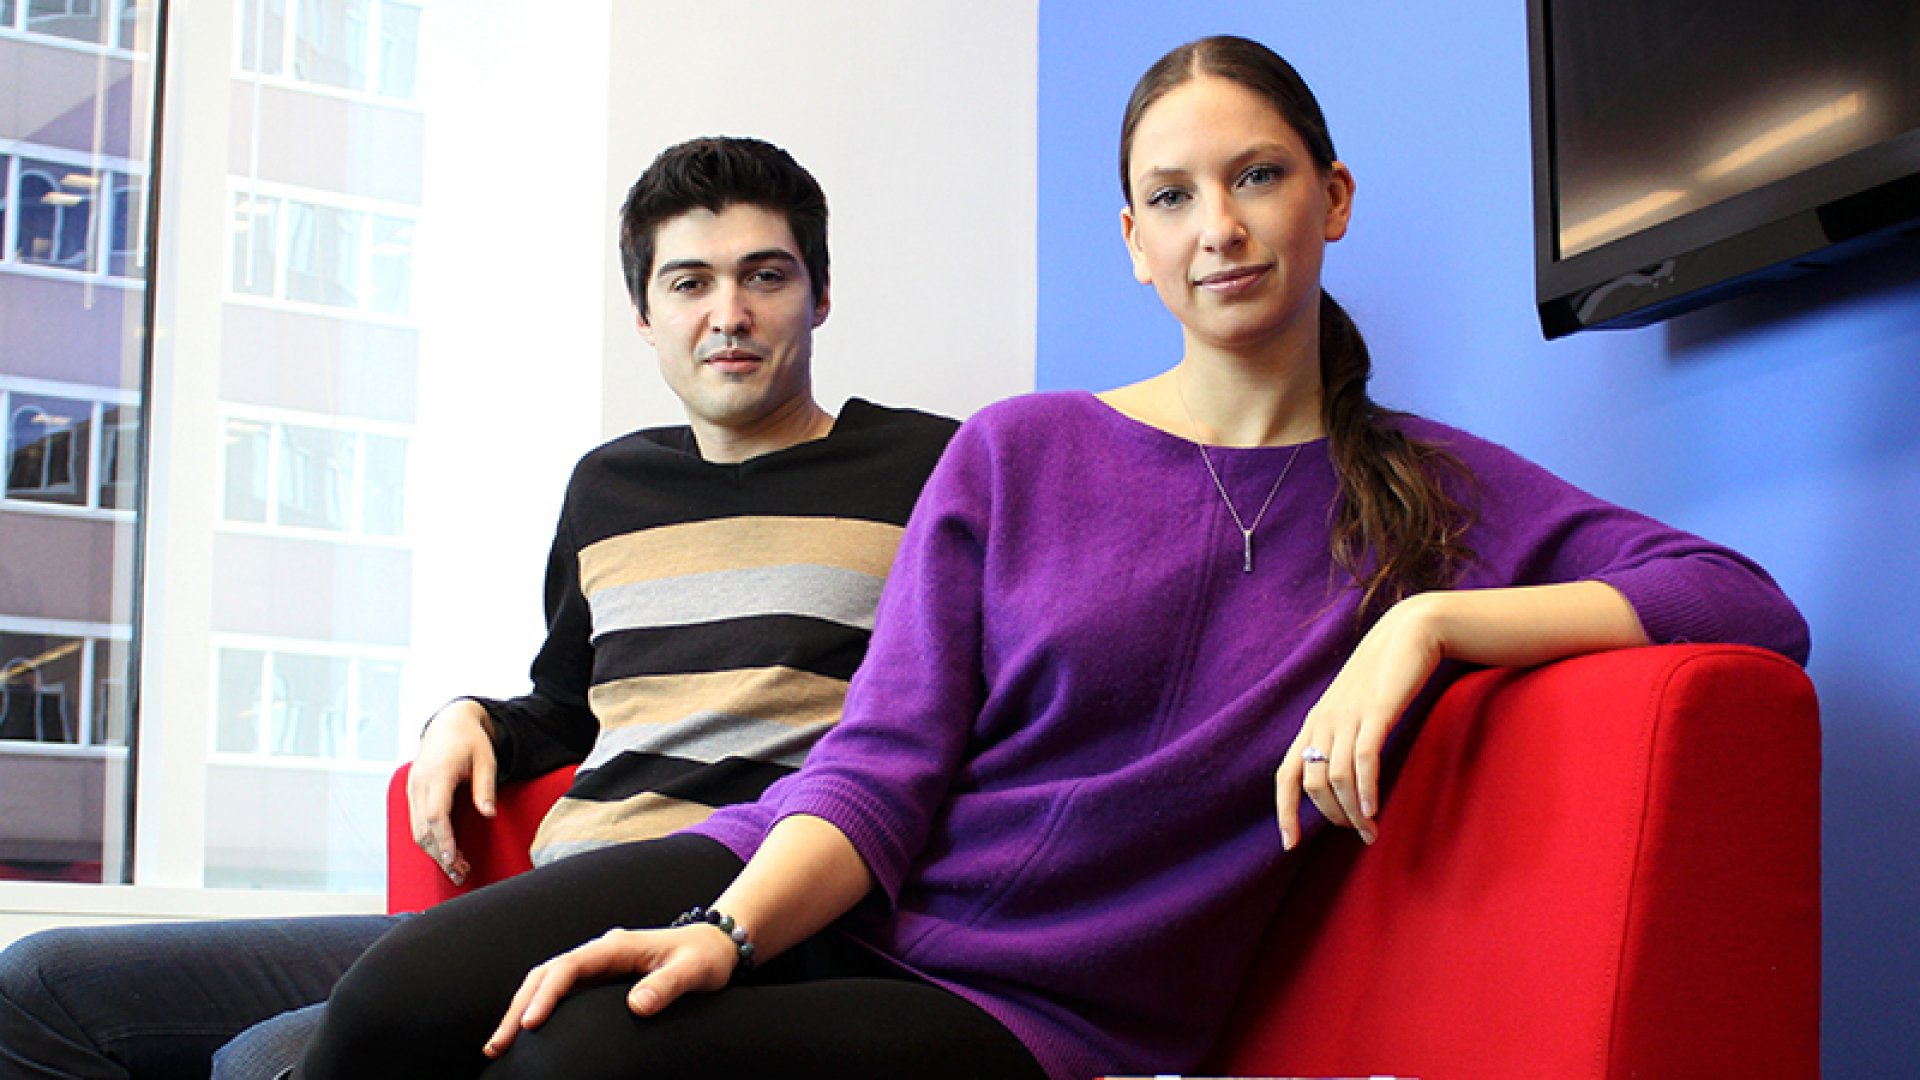 Igor Bratnikov and Polina Raygorodskaya are the co-founders of bus-scheduling service Wanderu.